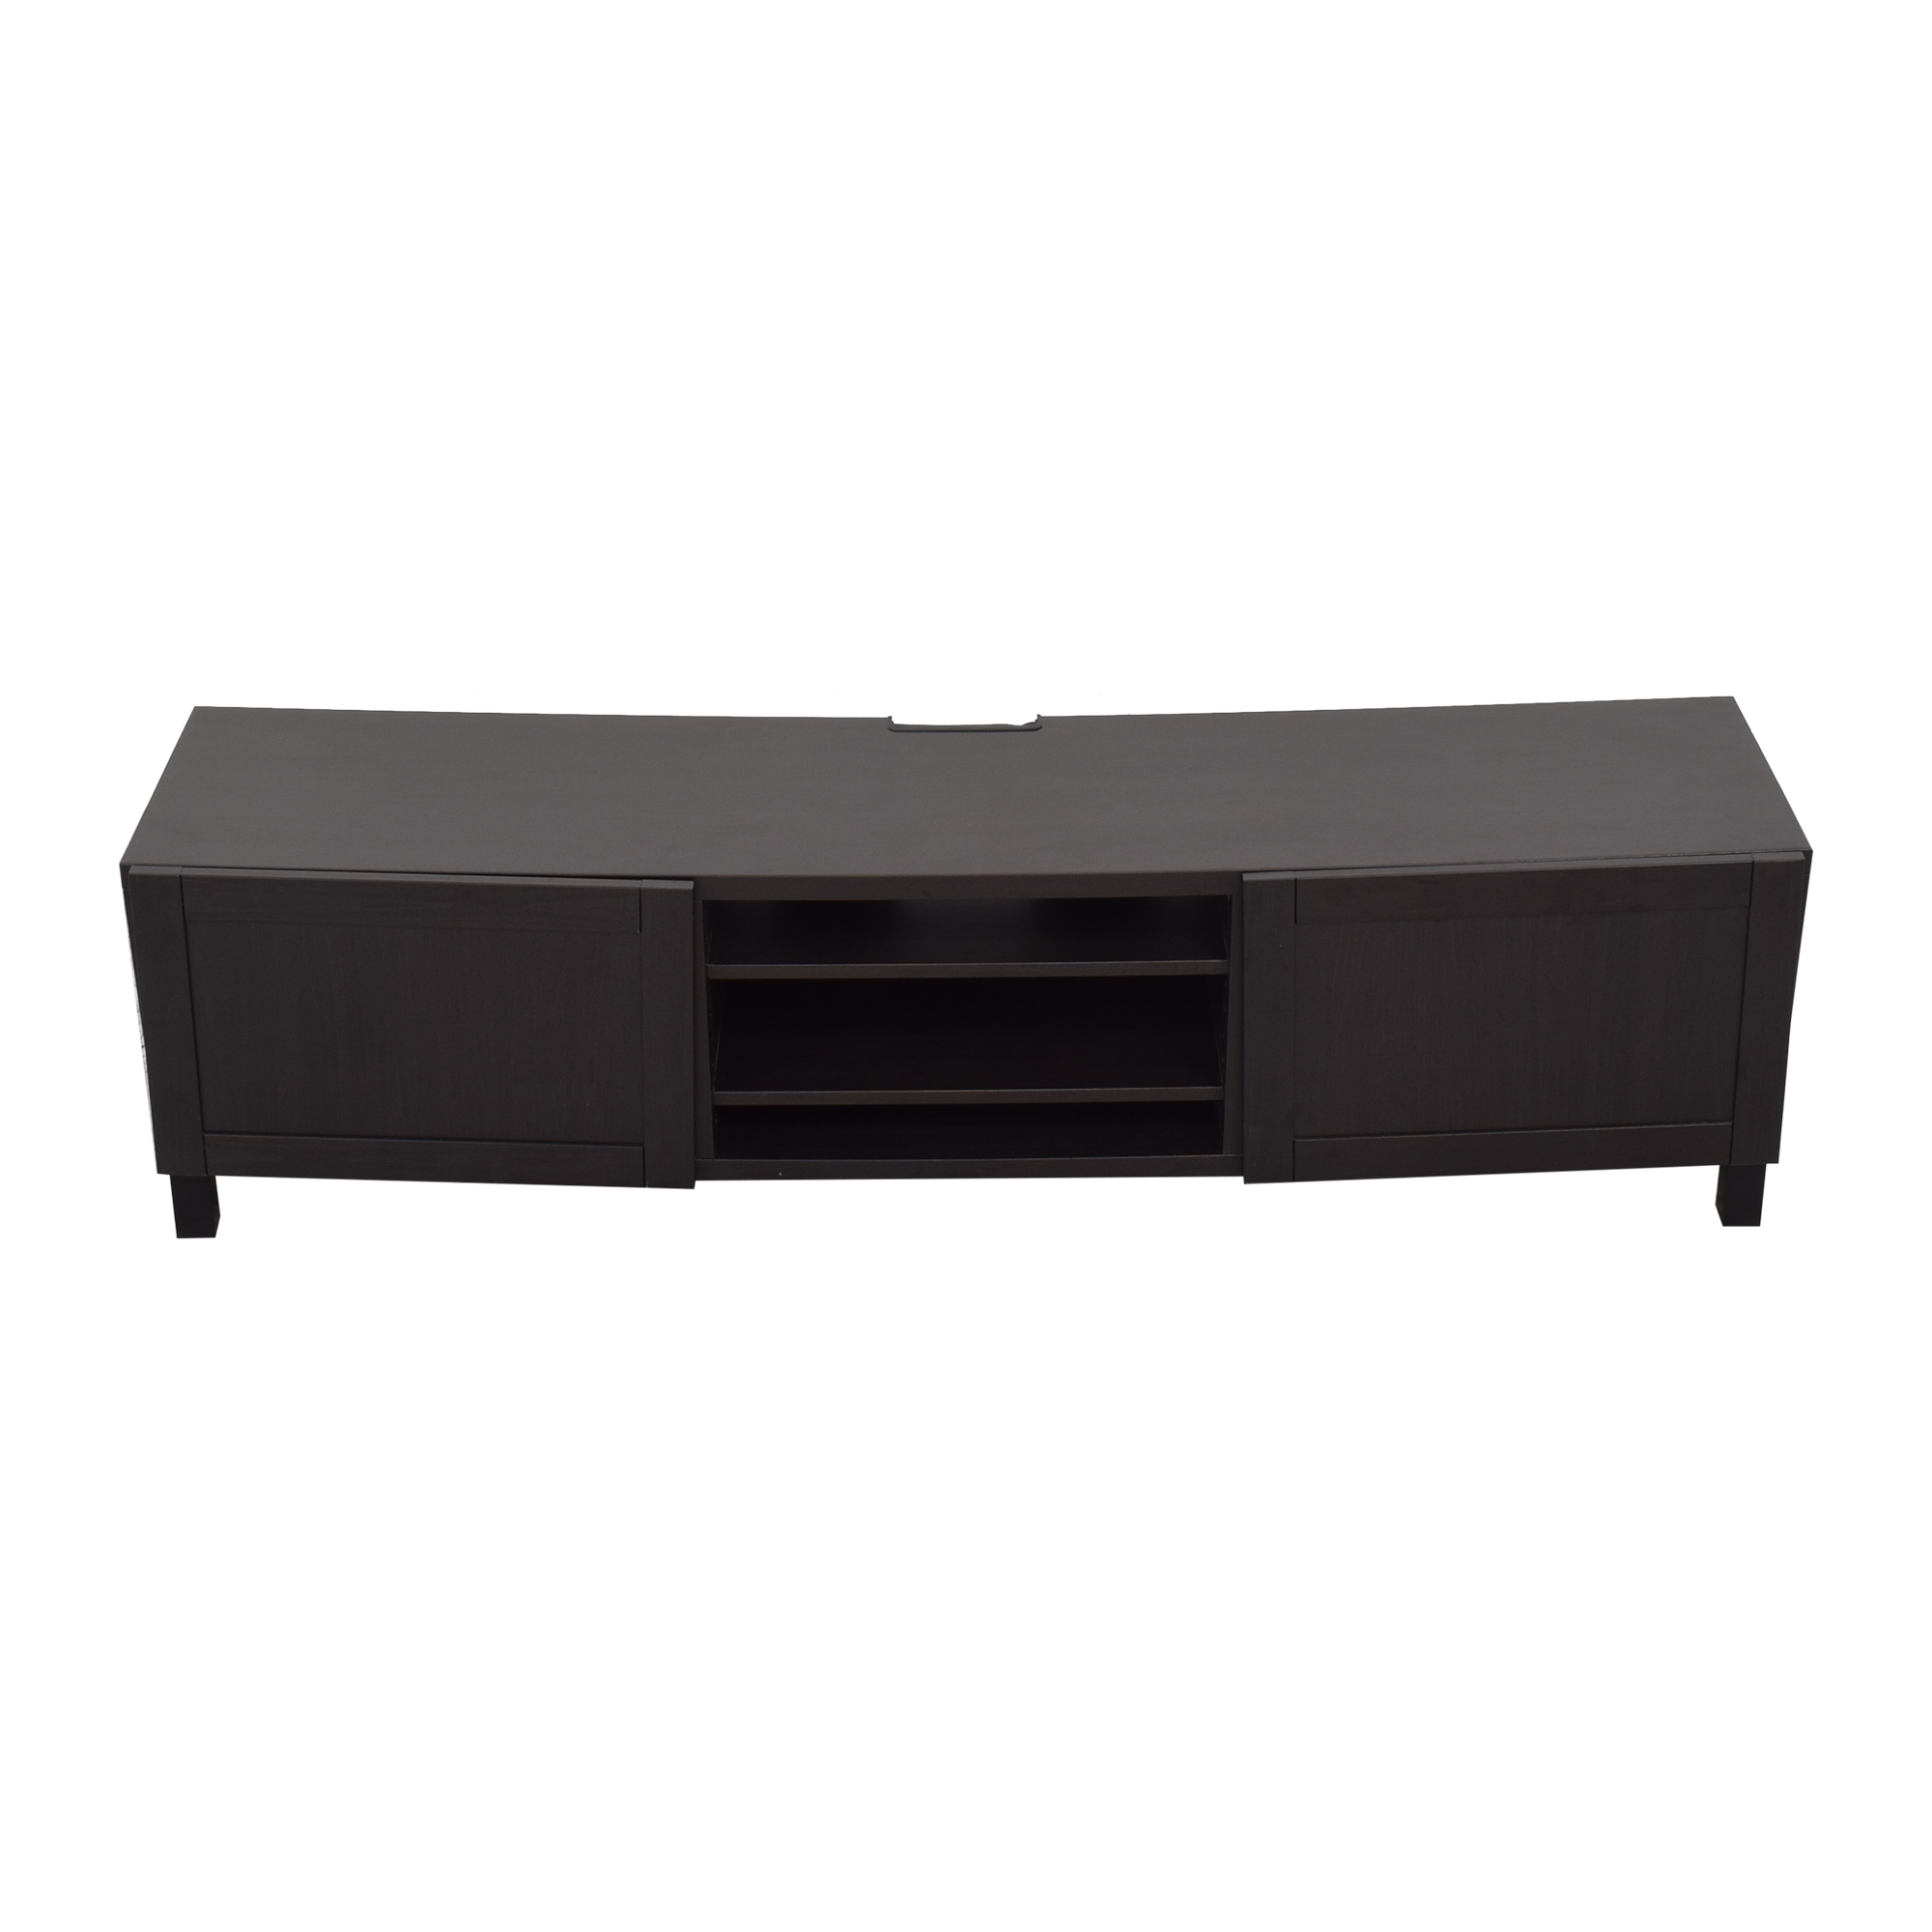 IKEA Ikea TV Stand nj